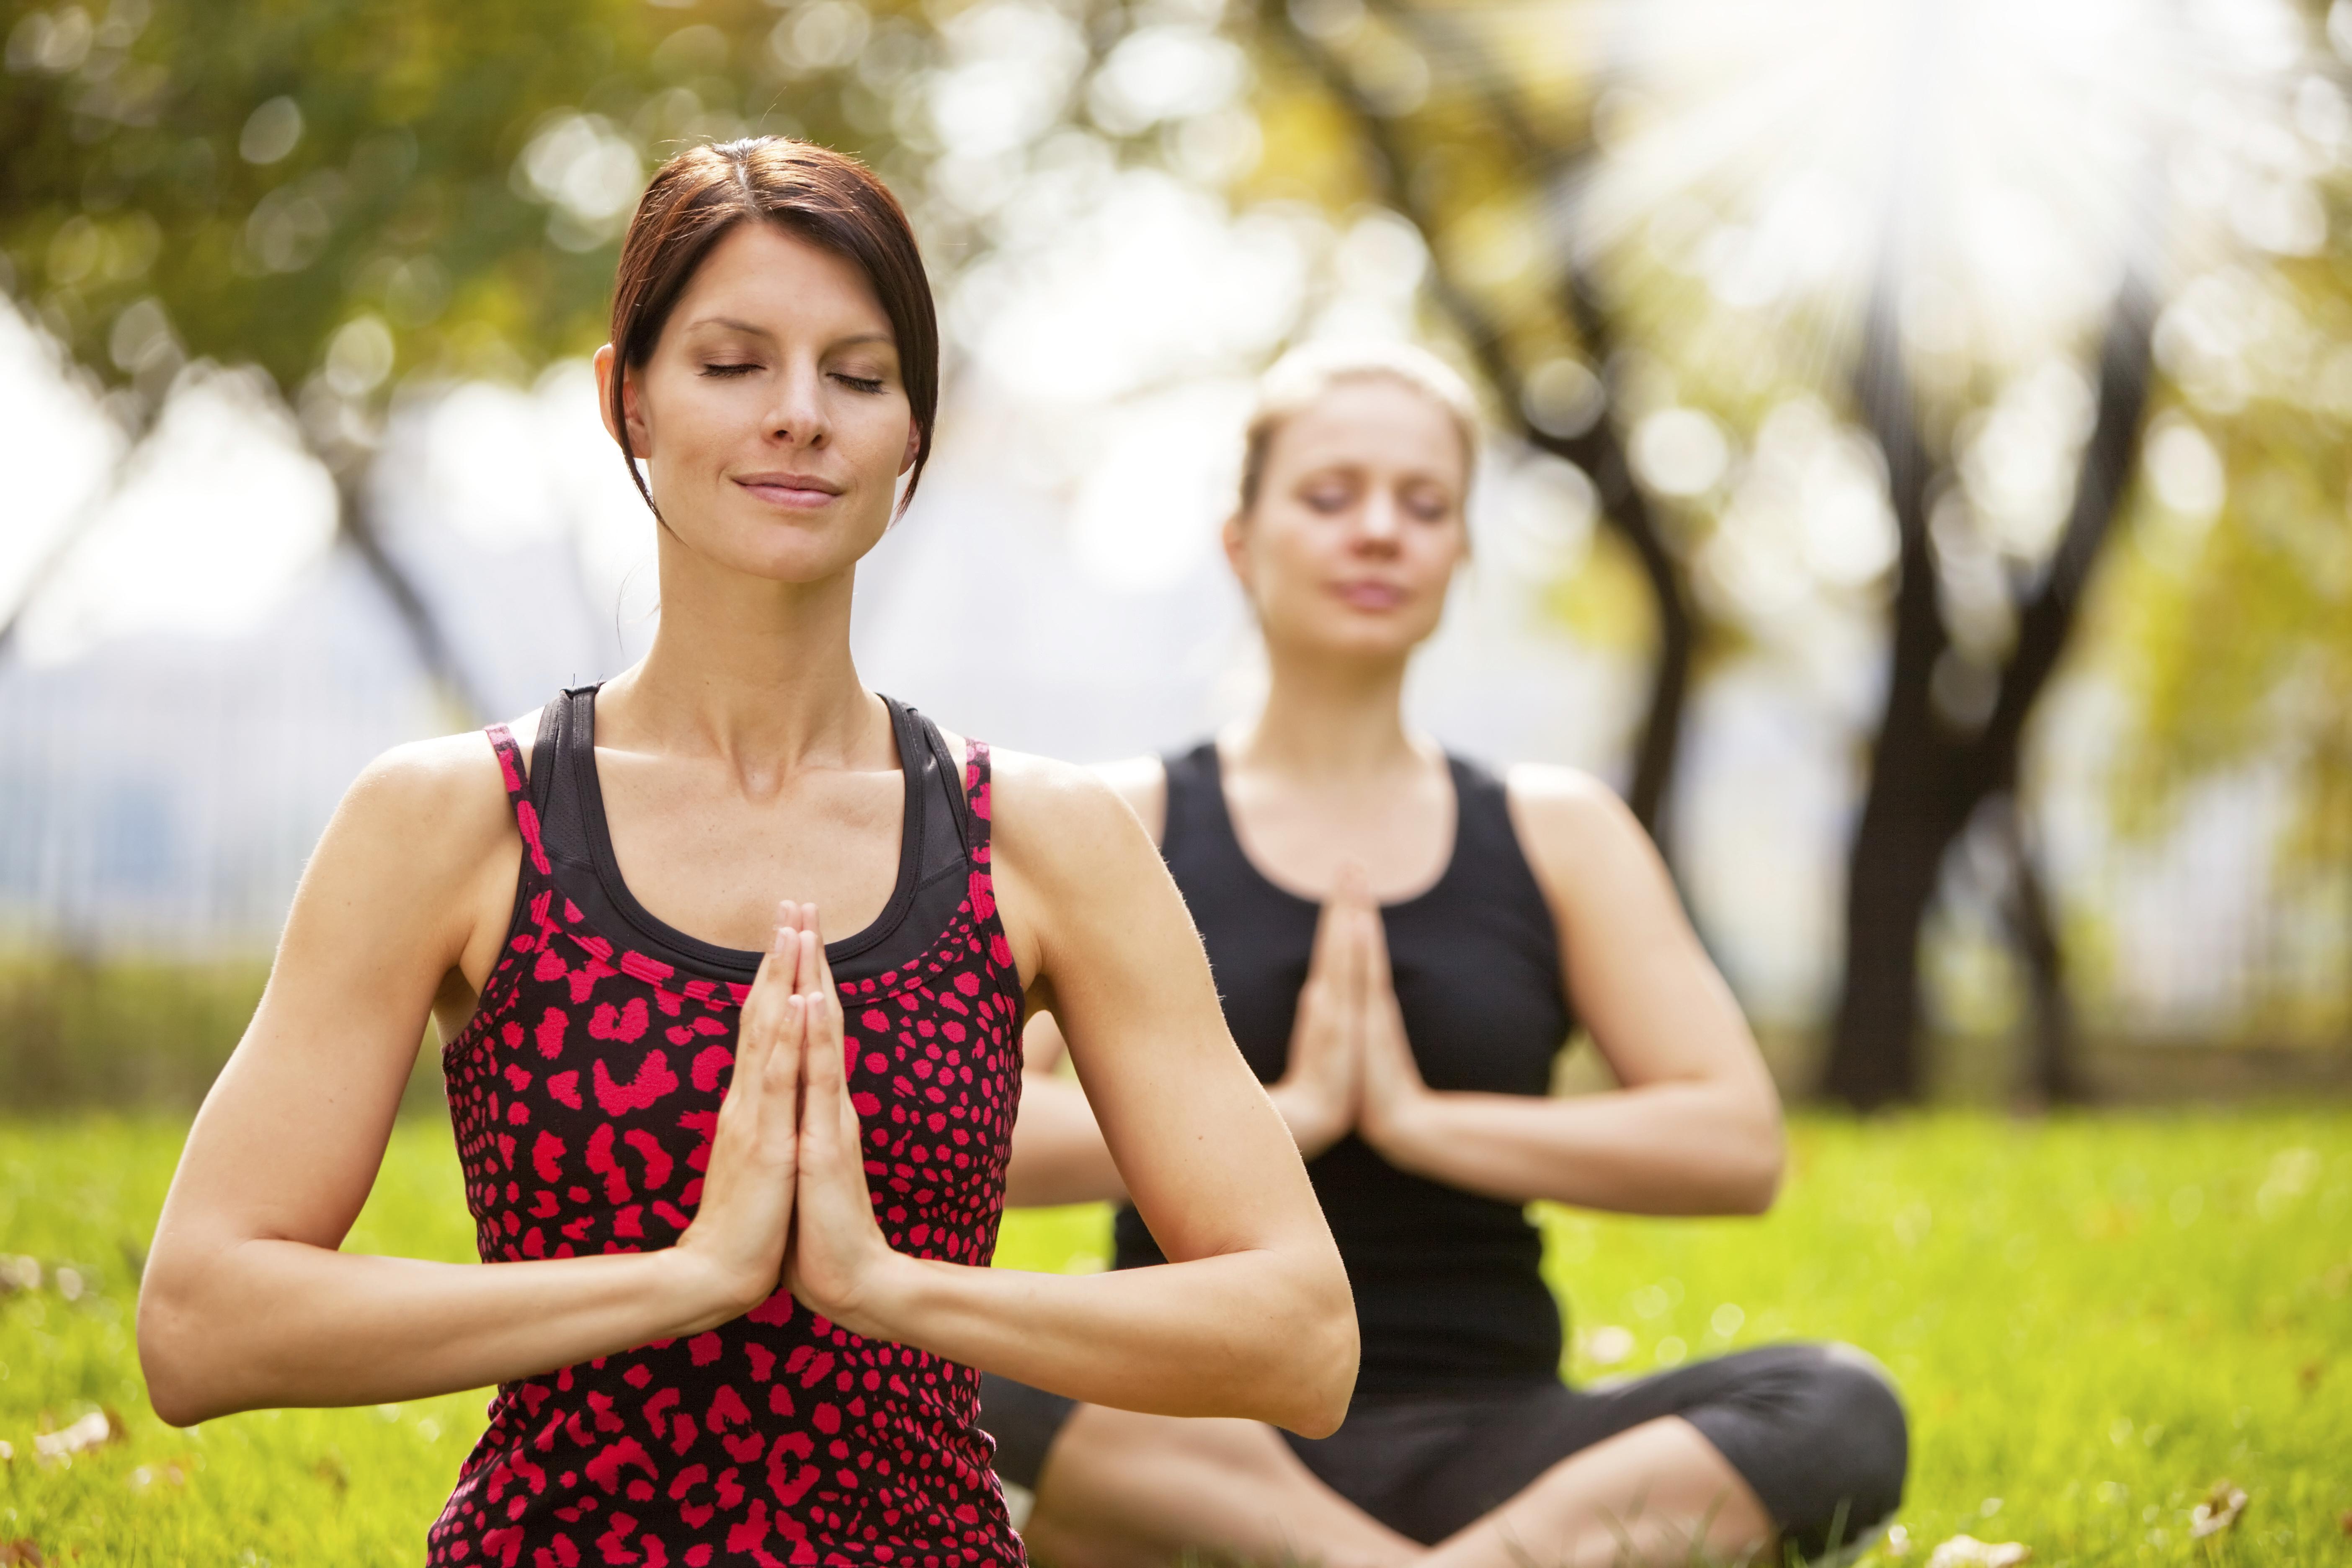 Ansiedade – Terapias Naturais Para Aliviar a Ansiedade